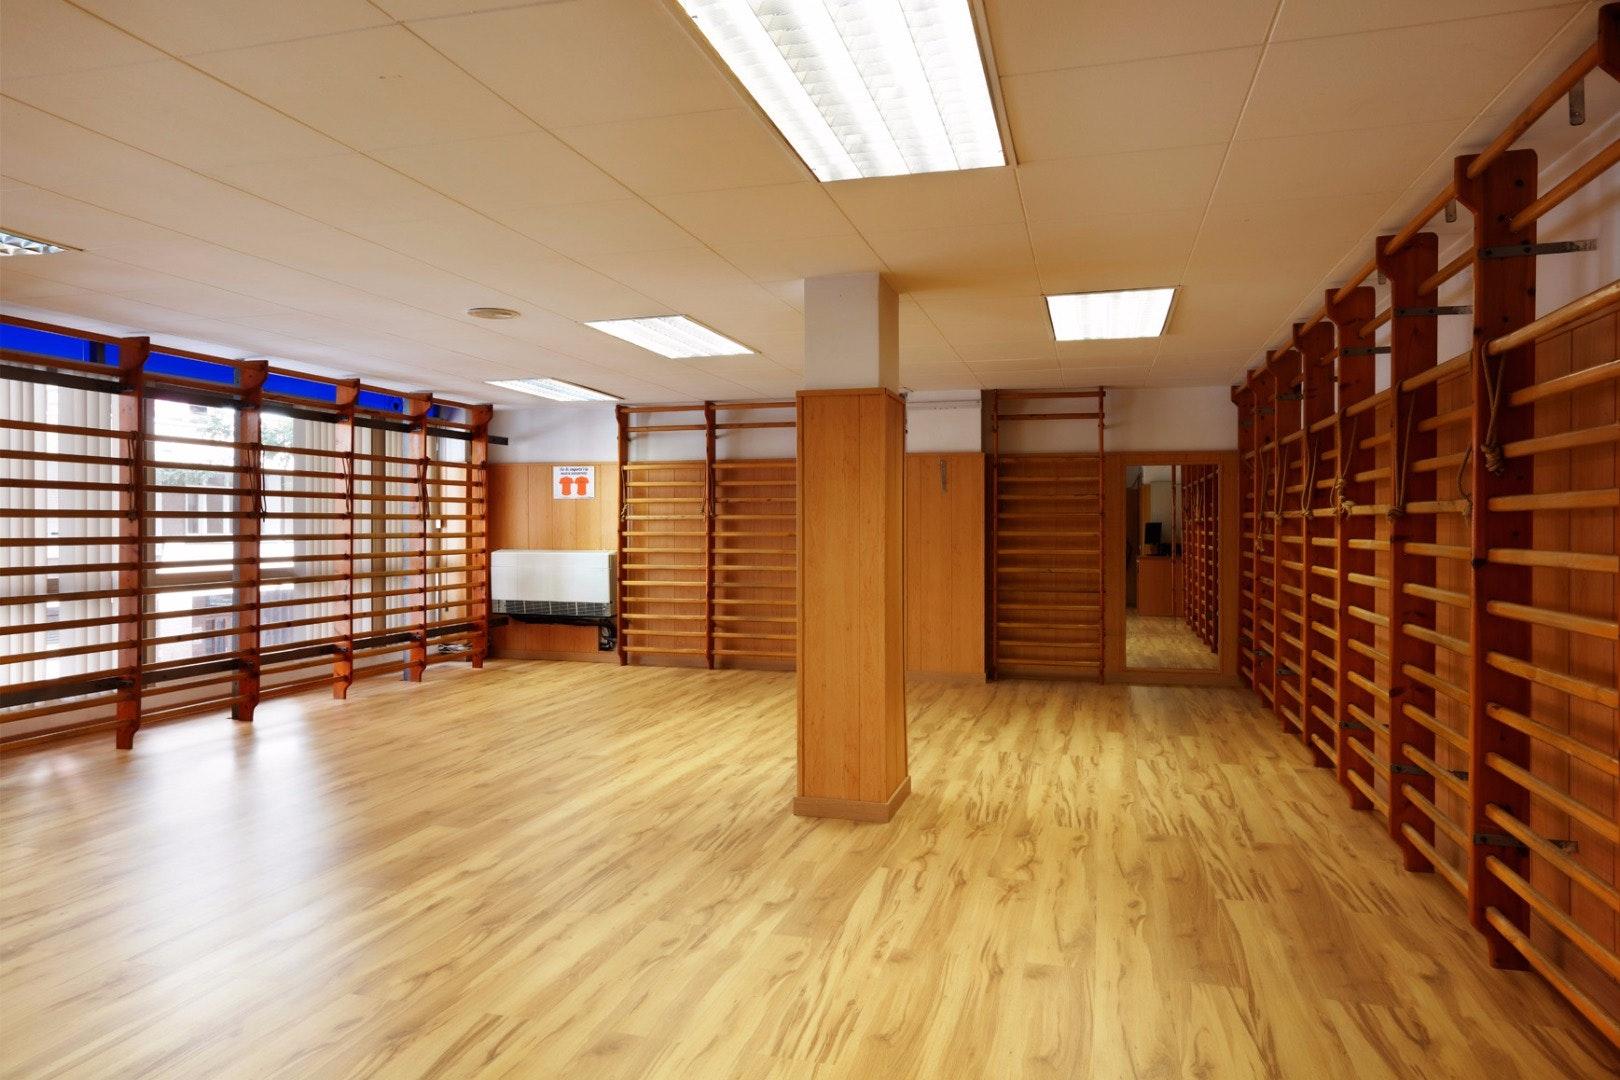 Picture 0 Deals for Gym Fisiogestión Hospitalet L'Hospitalet de Llobregat